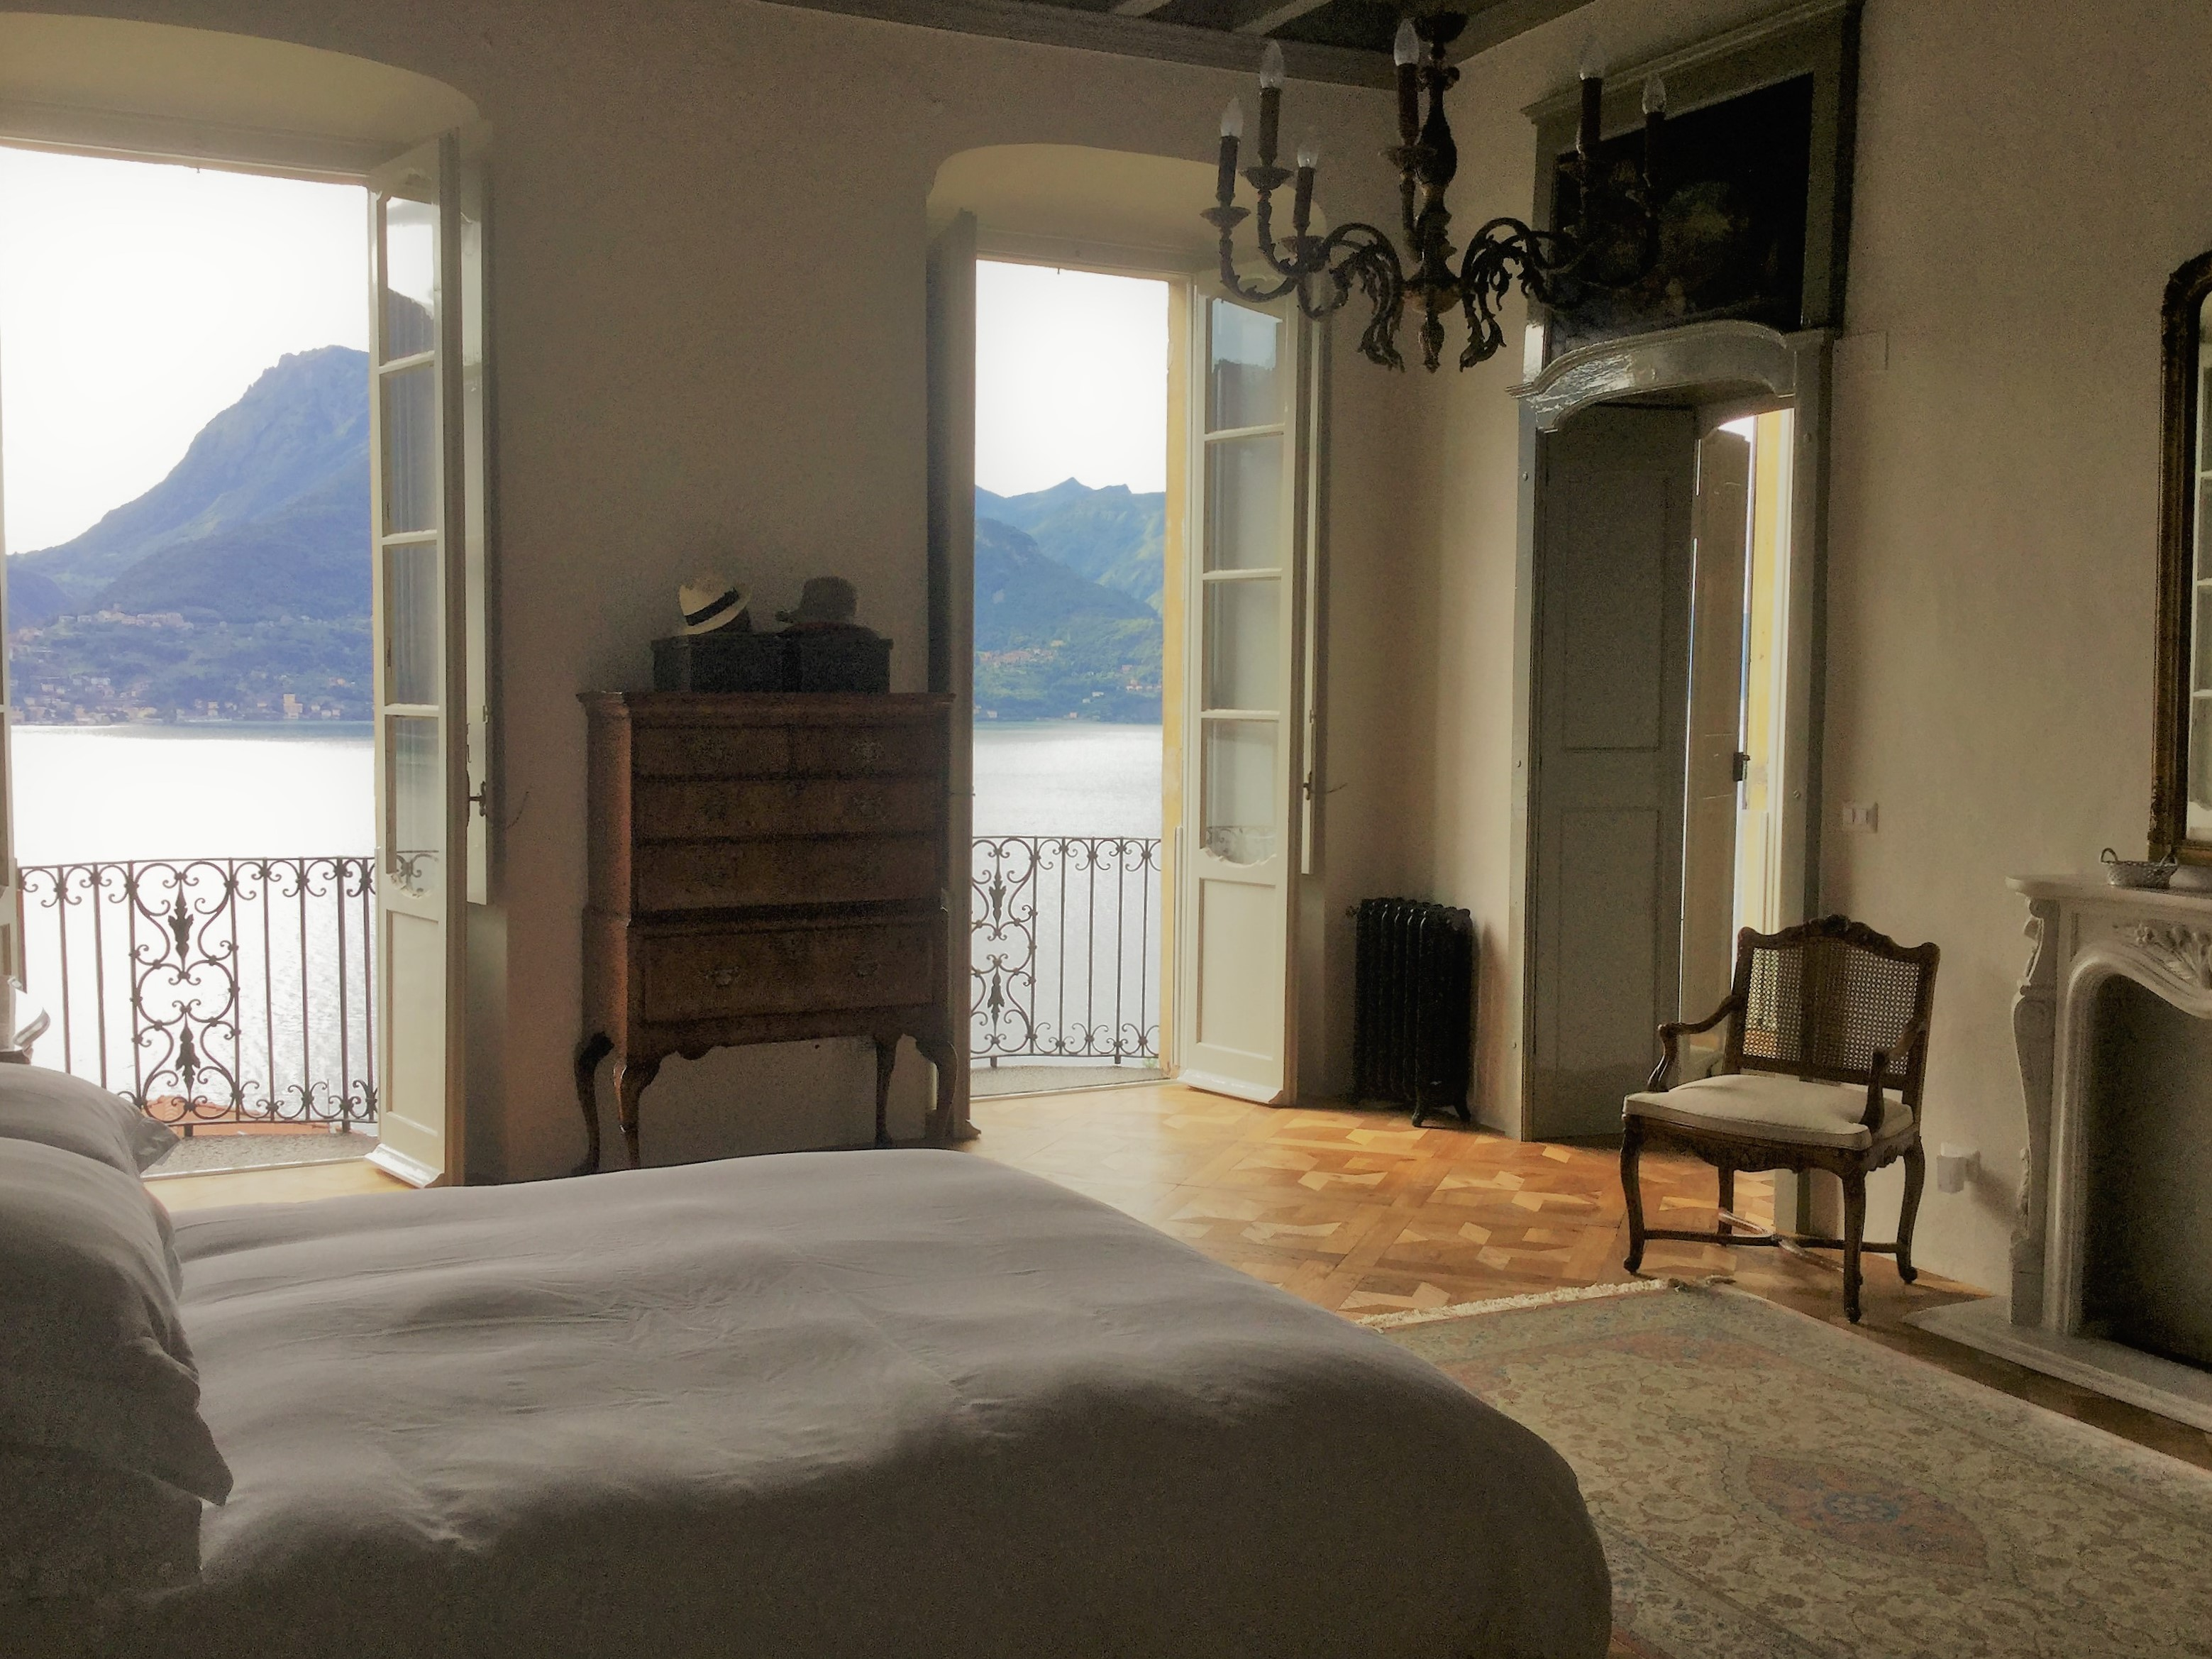 Lake Como - San Siro